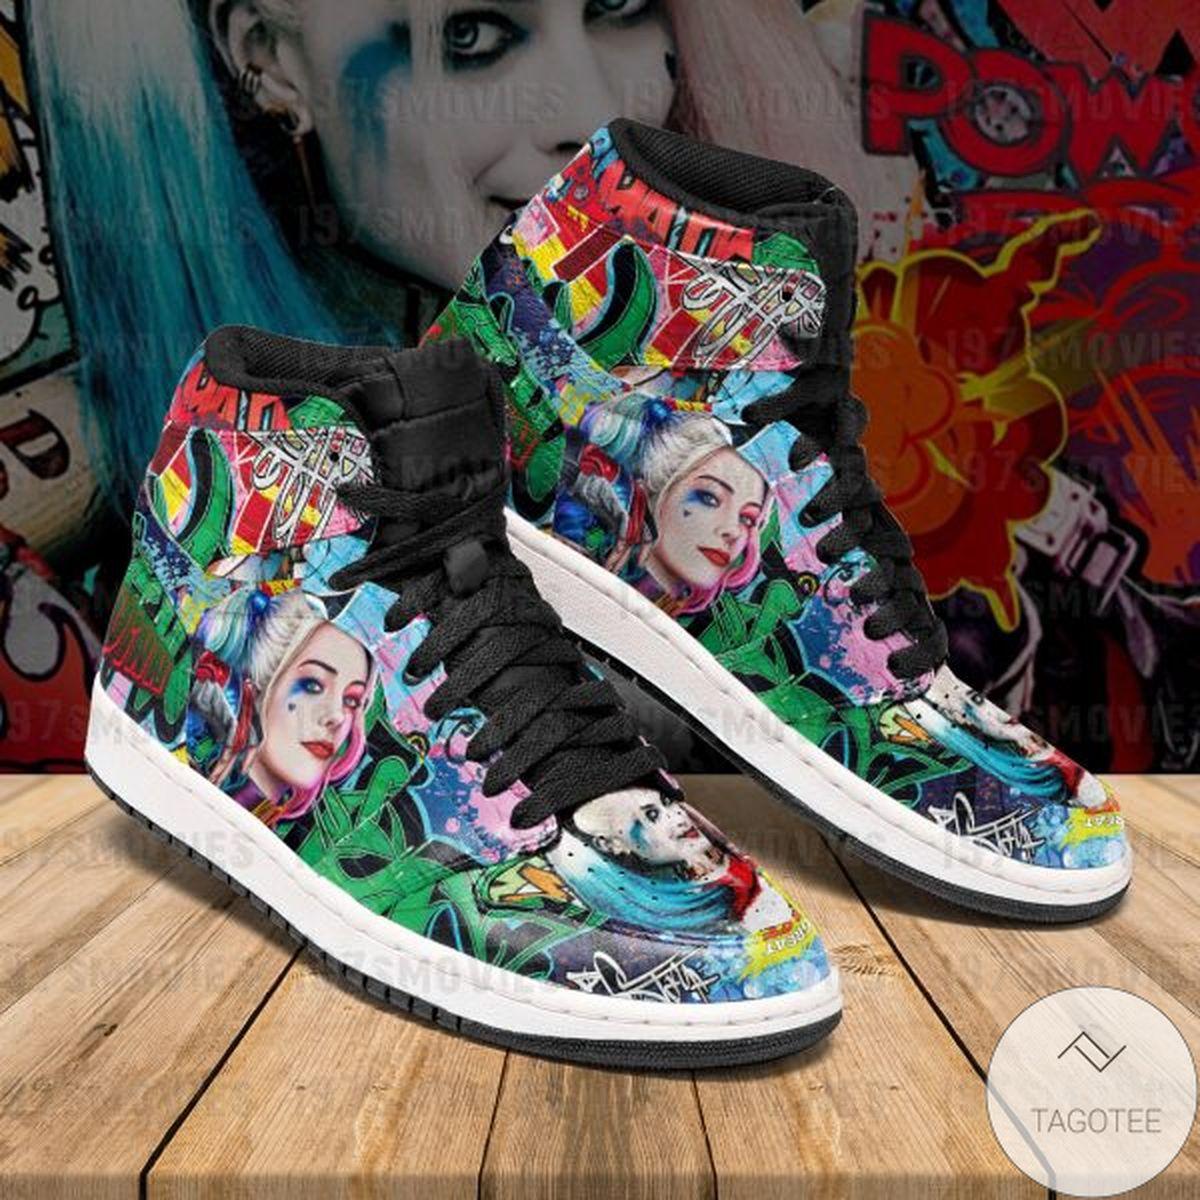 Sale Off Harley Quinn Sneaker Air Jordan High Top Shoes